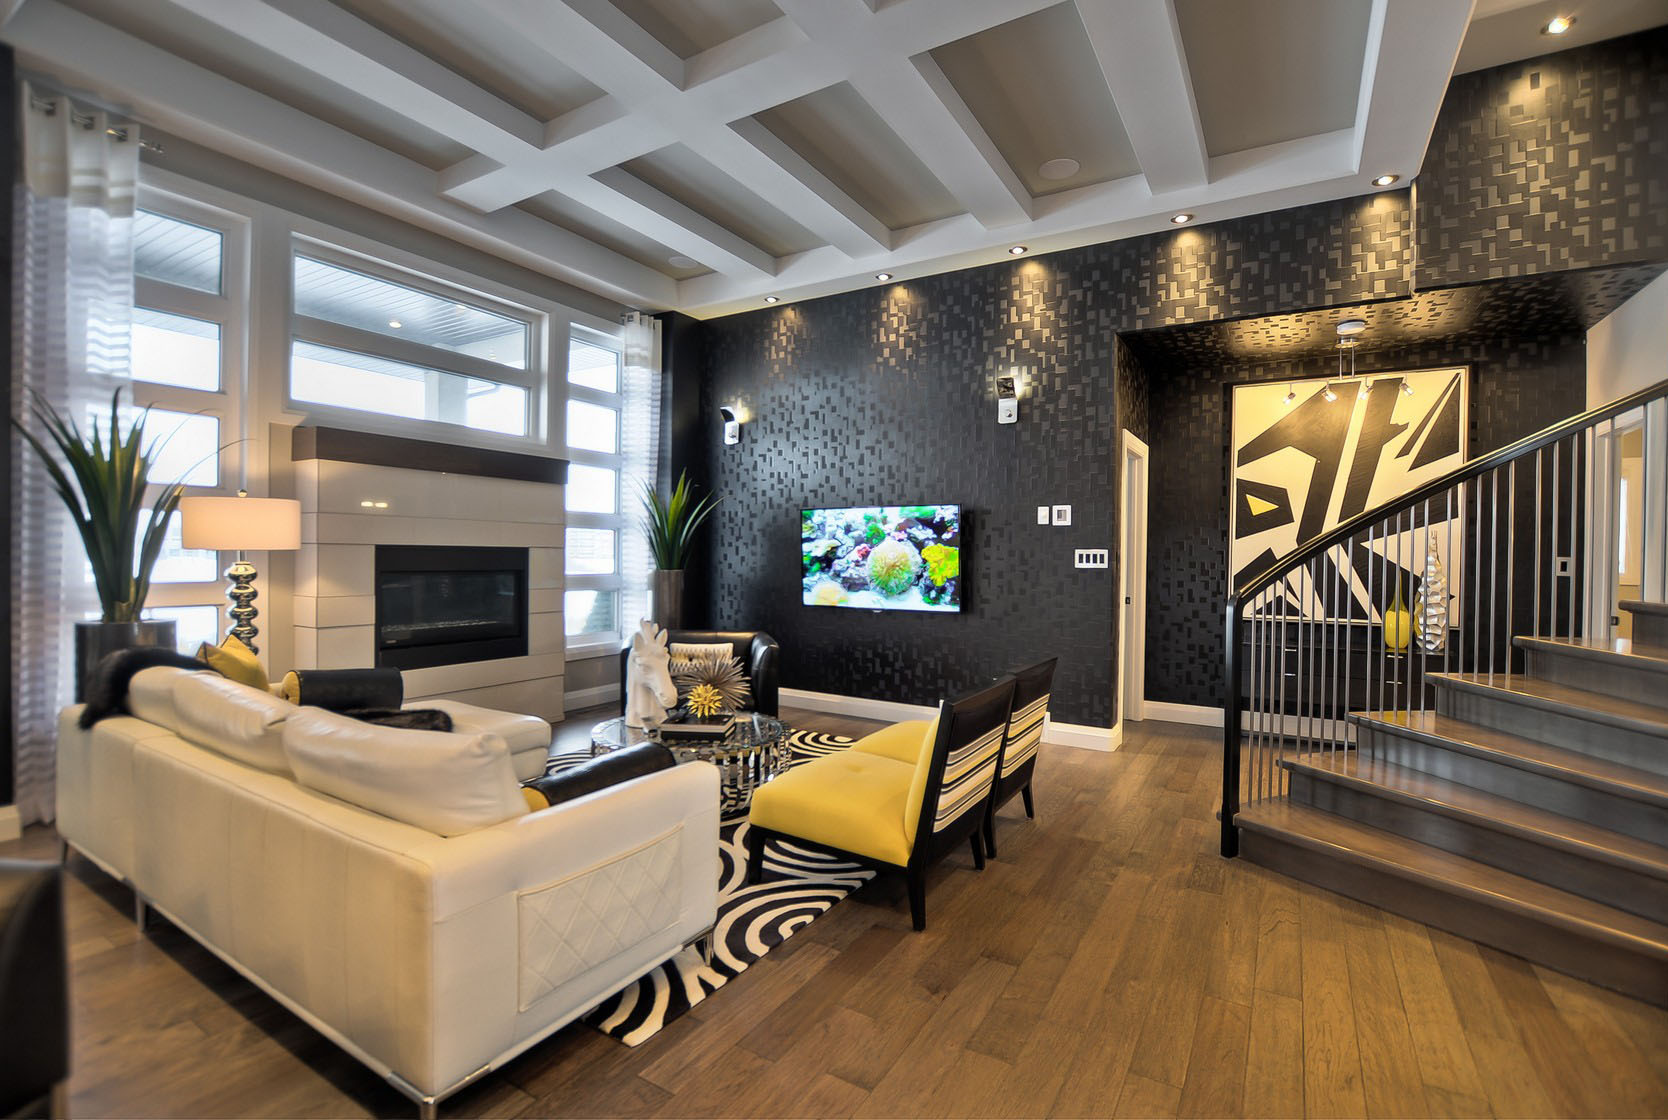 Contemporary Custom Dream Home In Saskatoon With Inspiring ... on Dream Home Interior  id=48555